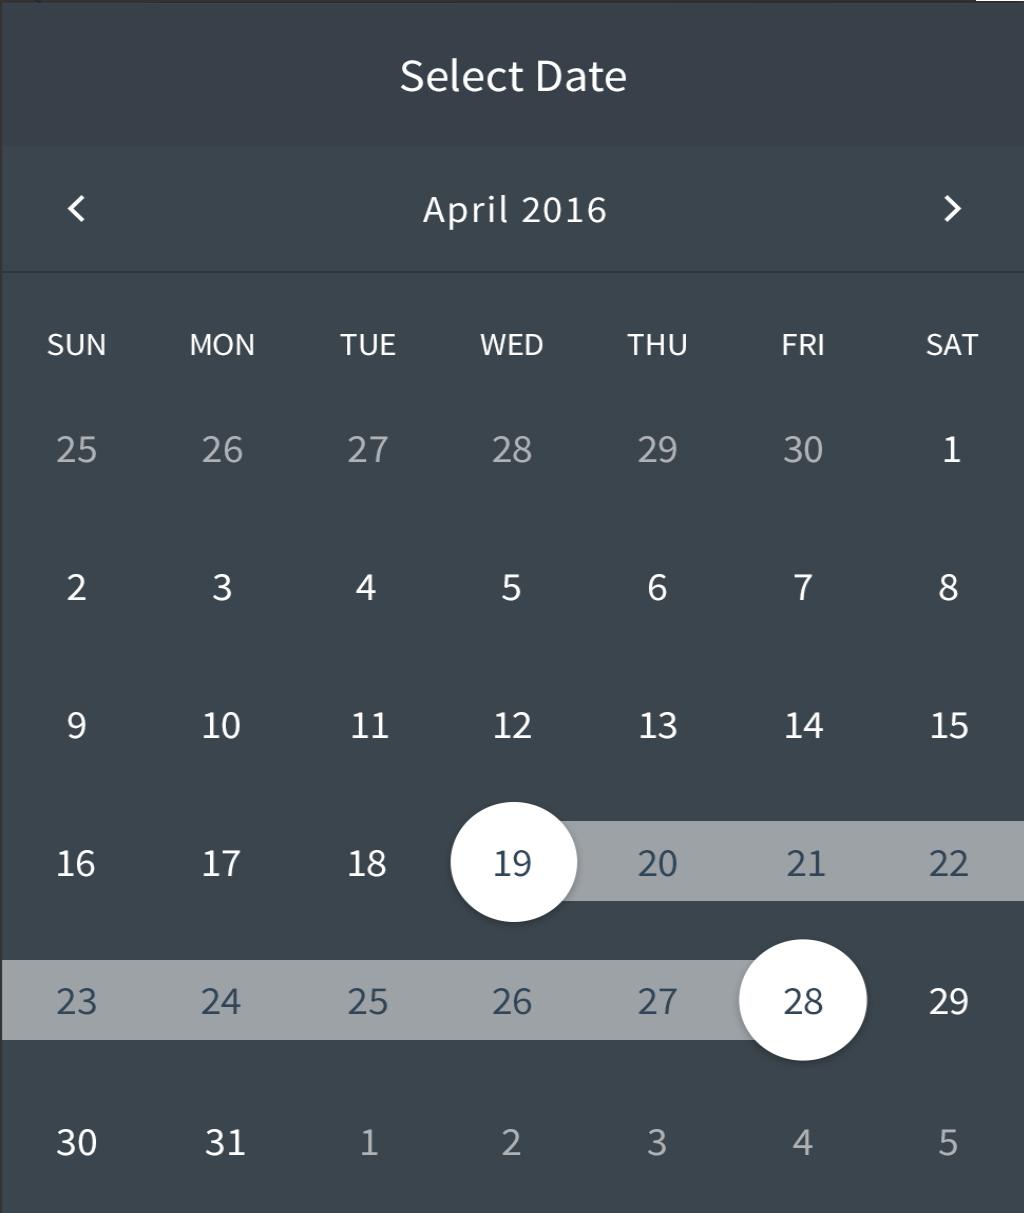 Custom Calendar Date Range Swipe Selection Android intended for Calendar Date Range Picker Android